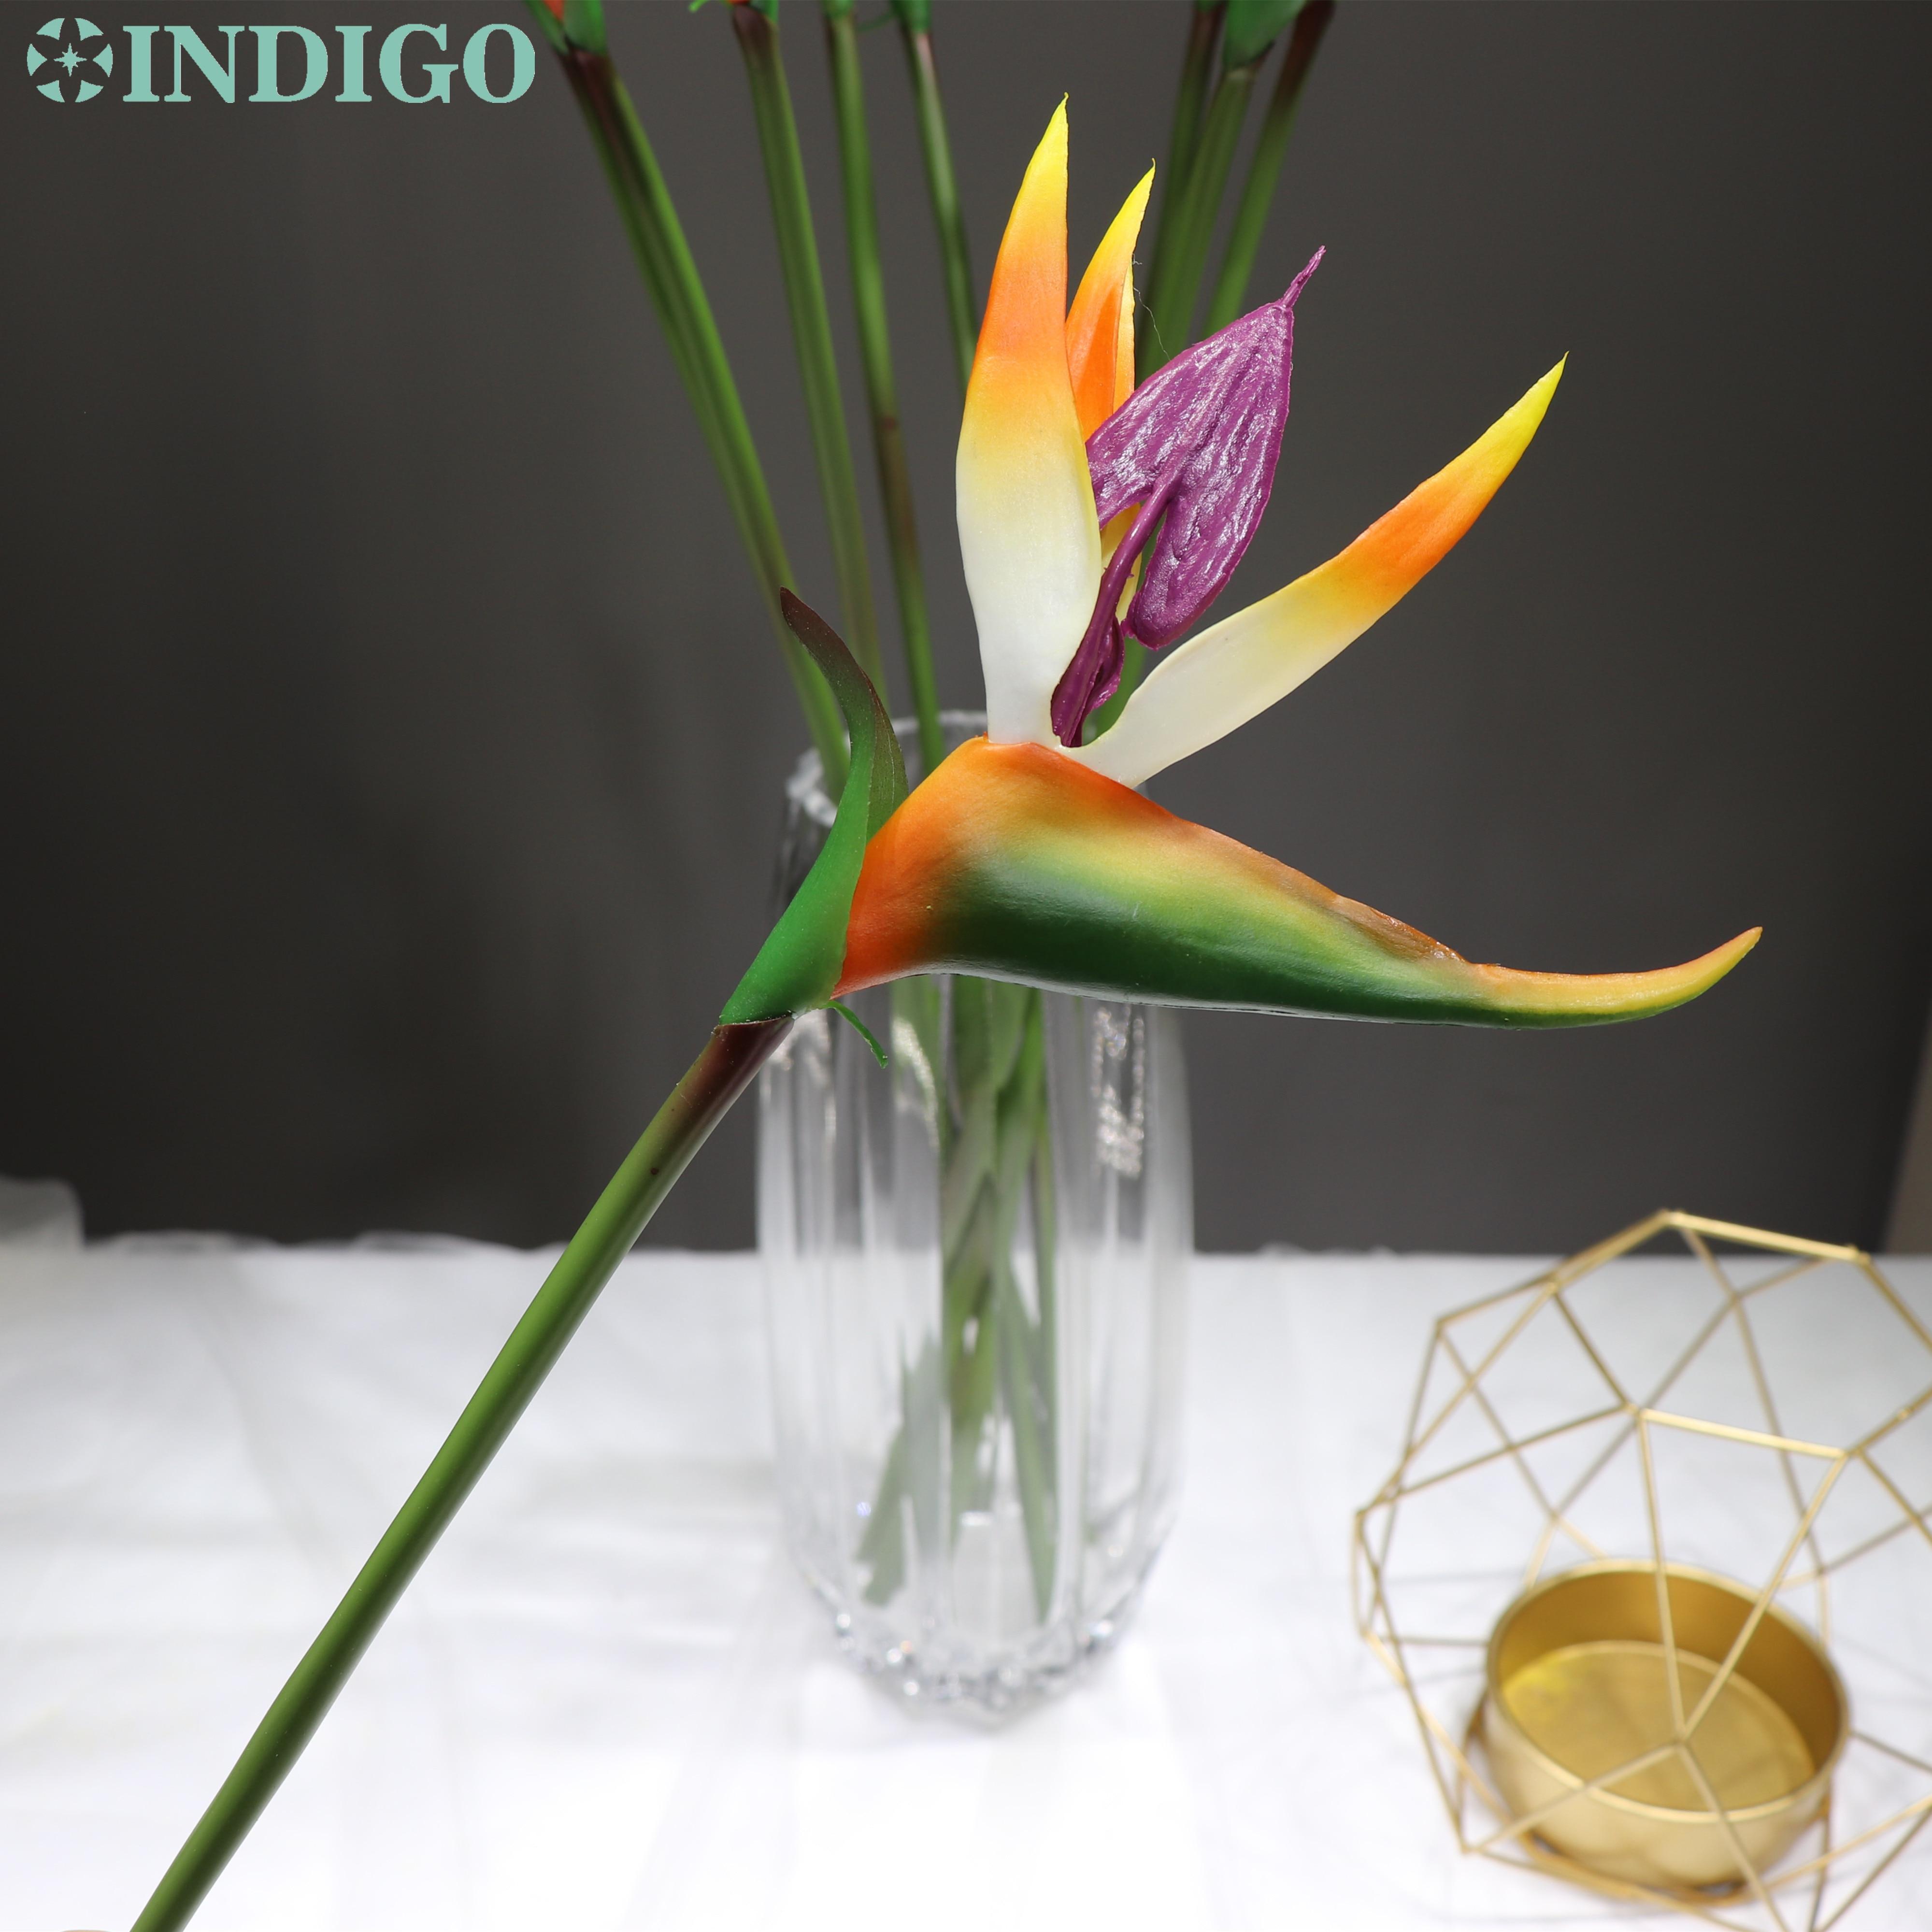 Indigo Single Flower 3 Sizes Bird Of Paradise Plastic Artificial